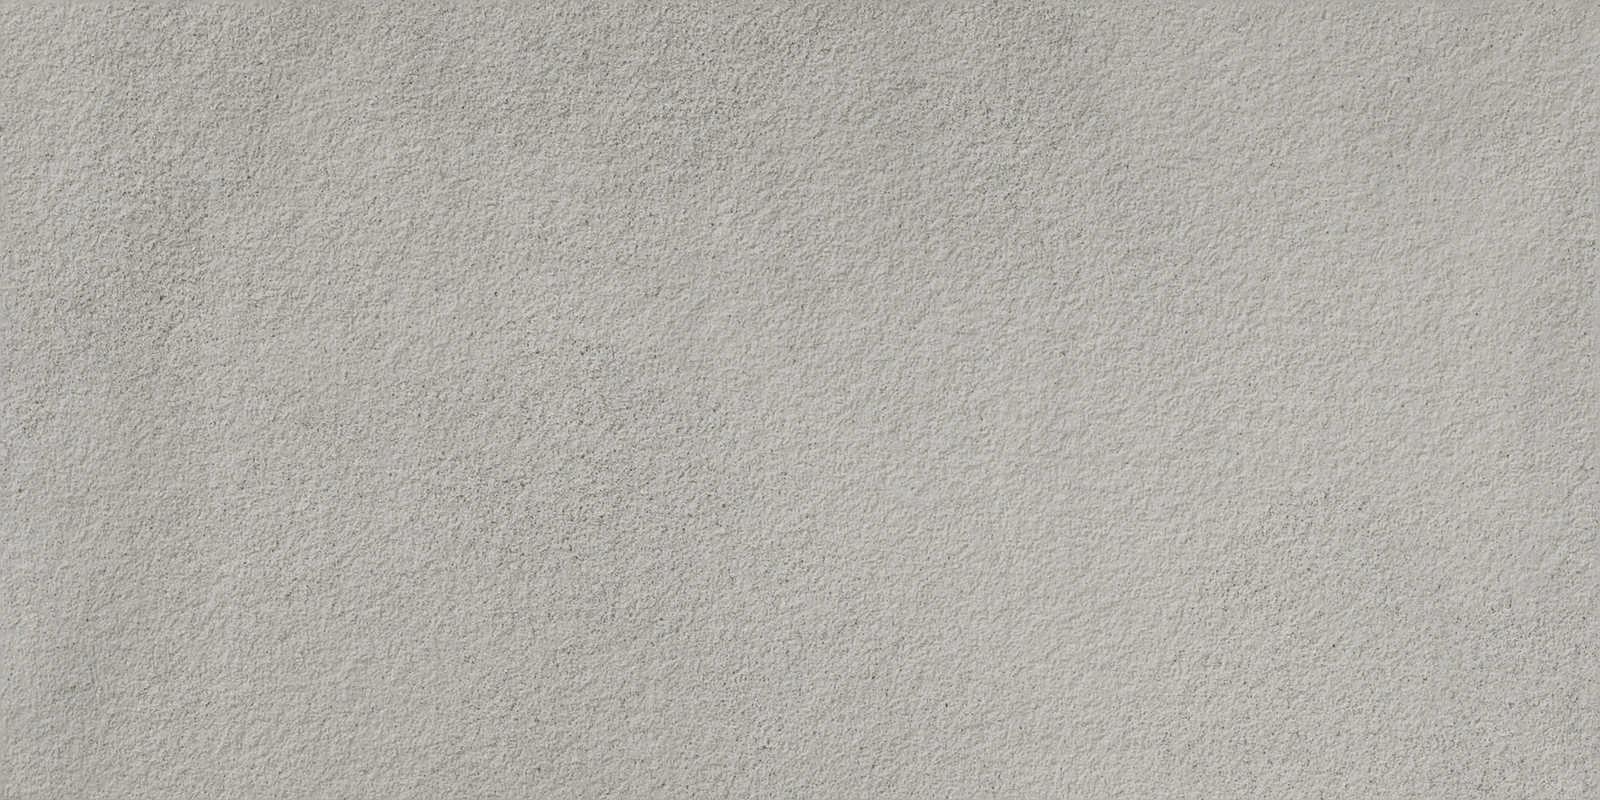 APPEAL  OUTDOOR 300X600 GREY - (Euro/Mq 17,57)